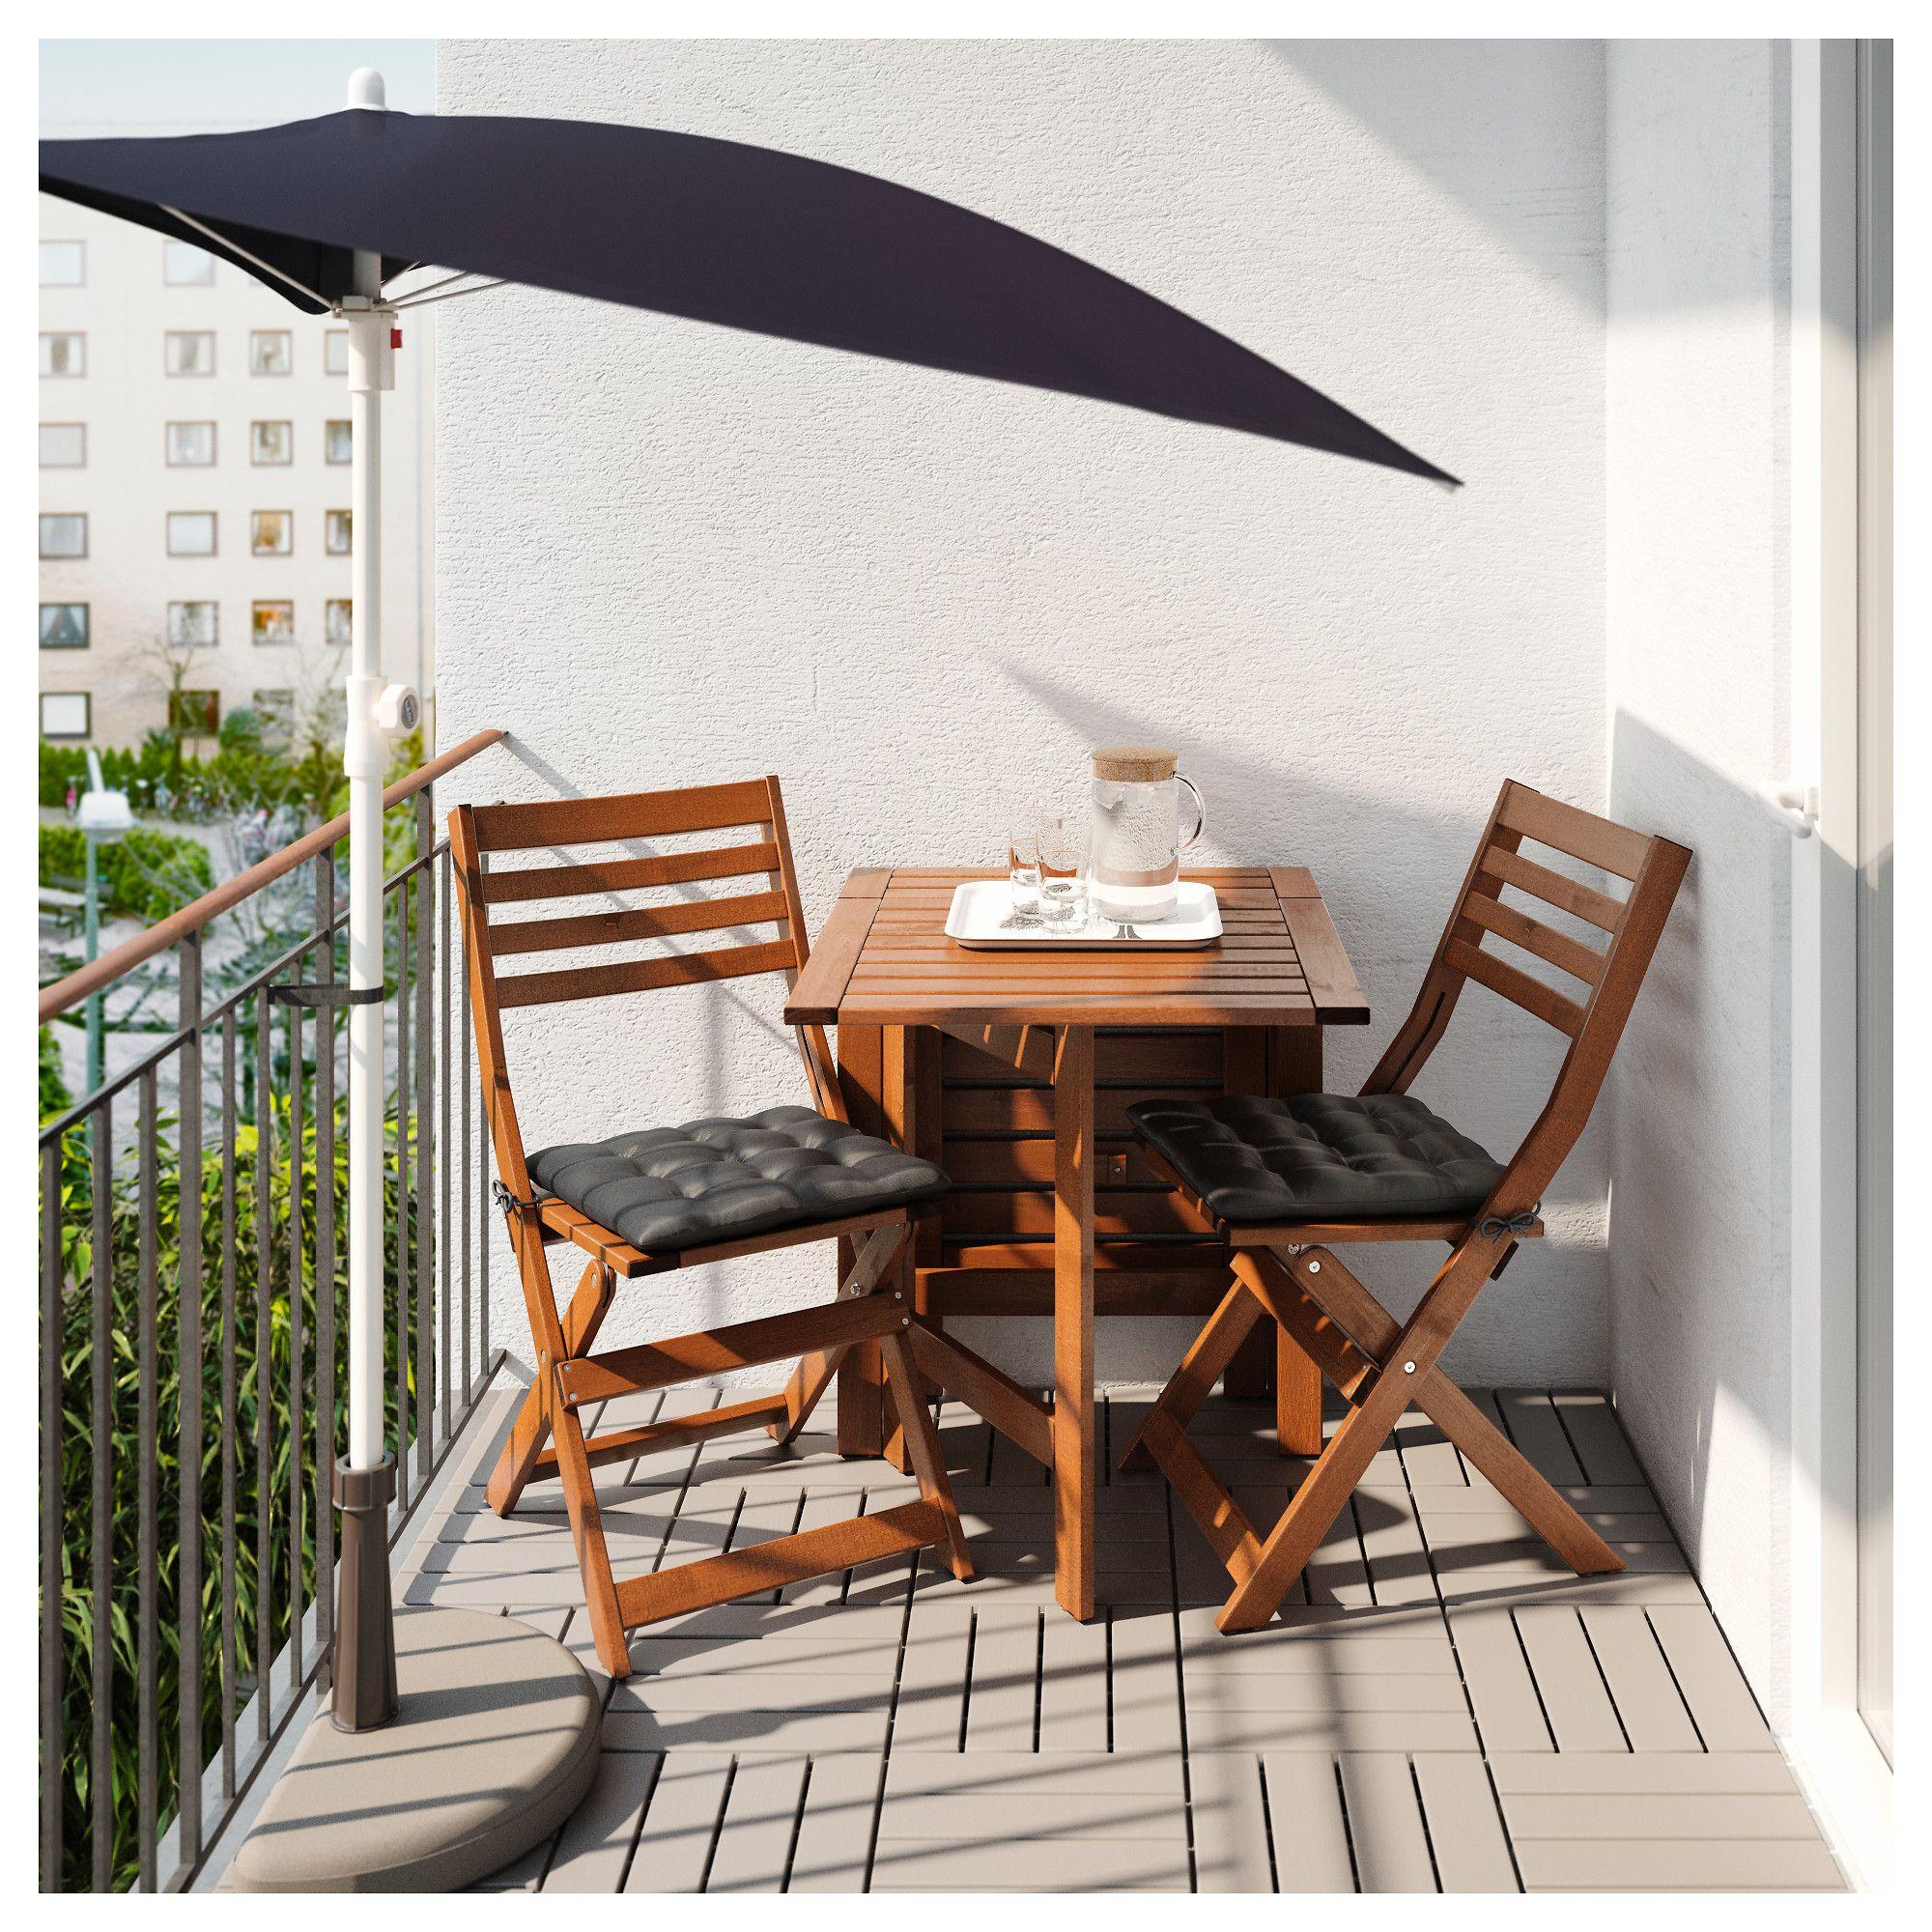 ikea flis patio umbrella black in 2019 products pinterest sonnenschirm balkon and schirm. Black Bedroom Furniture Sets. Home Design Ideas